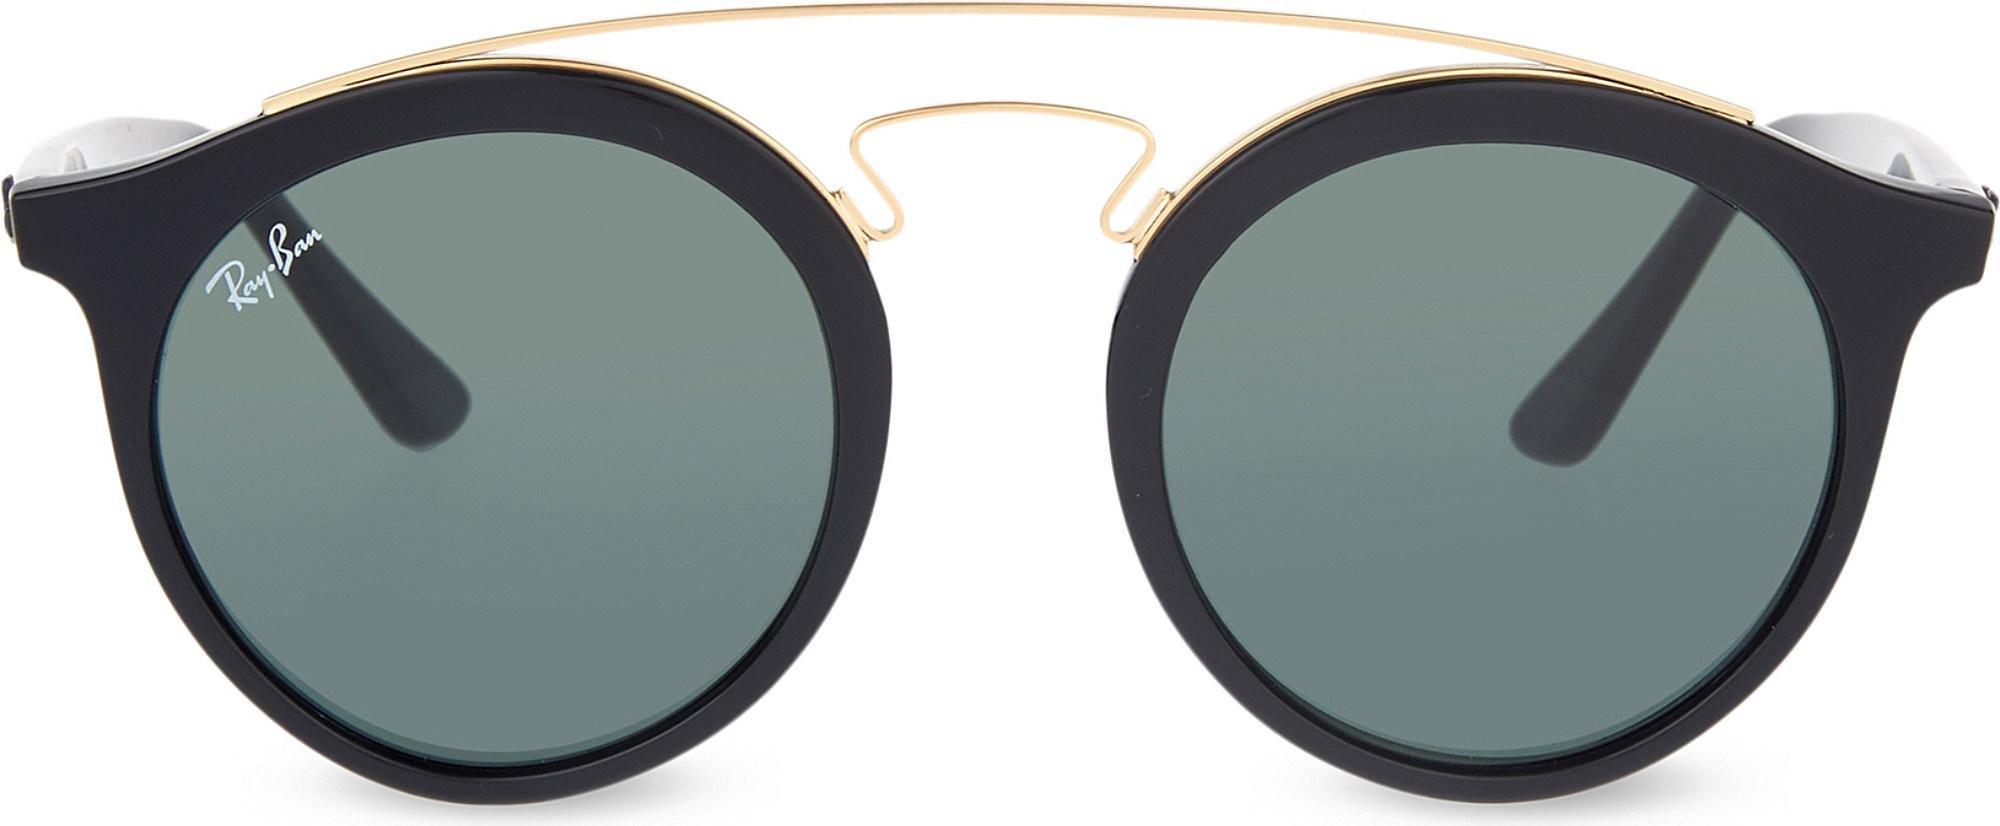 db34e18eba6b7 Lyst - Ray-Ban Rb4256 Round-frame Sunglasses in Black